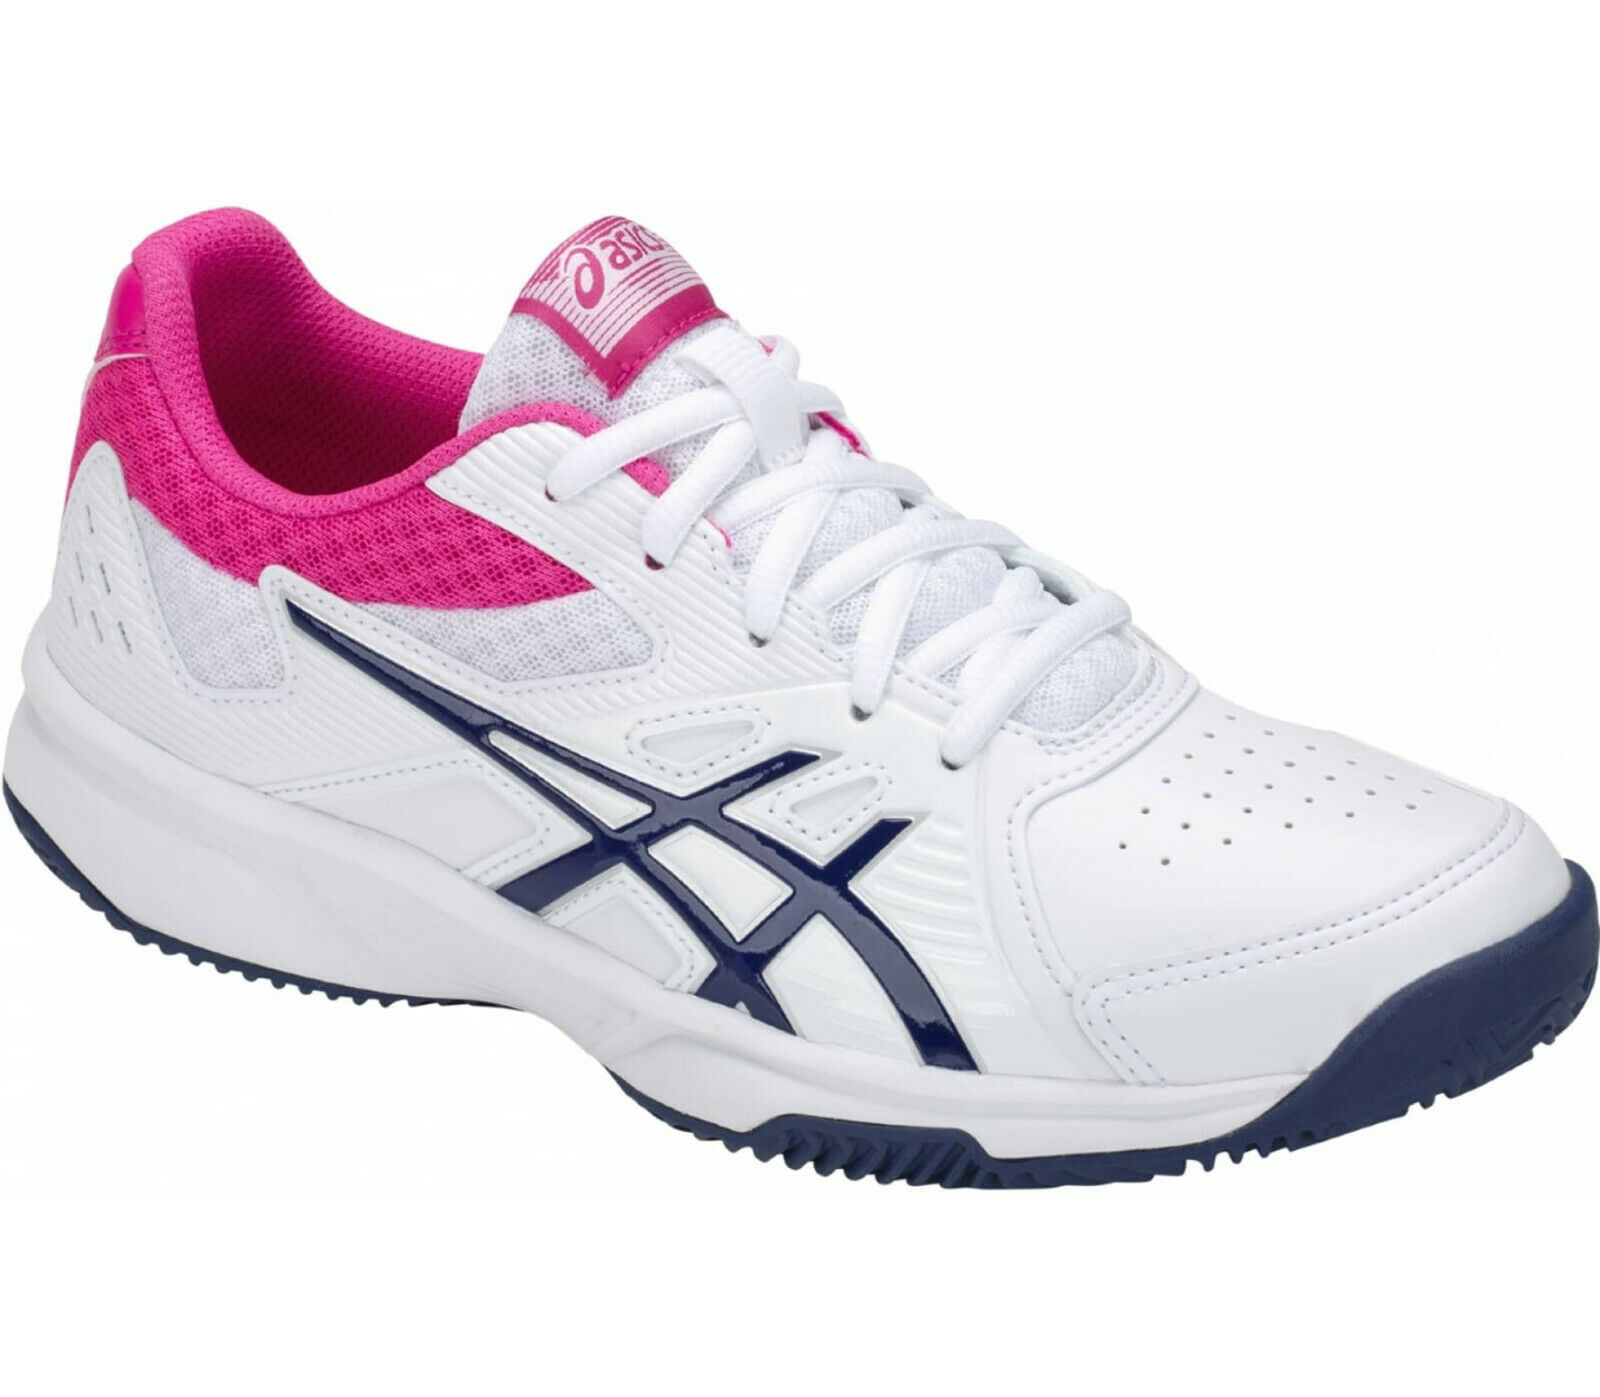 Zapatos  tenis Asics Dama Tribunal diapositiva-PVP 54.99   - Envío Gratis  minorista de fitness